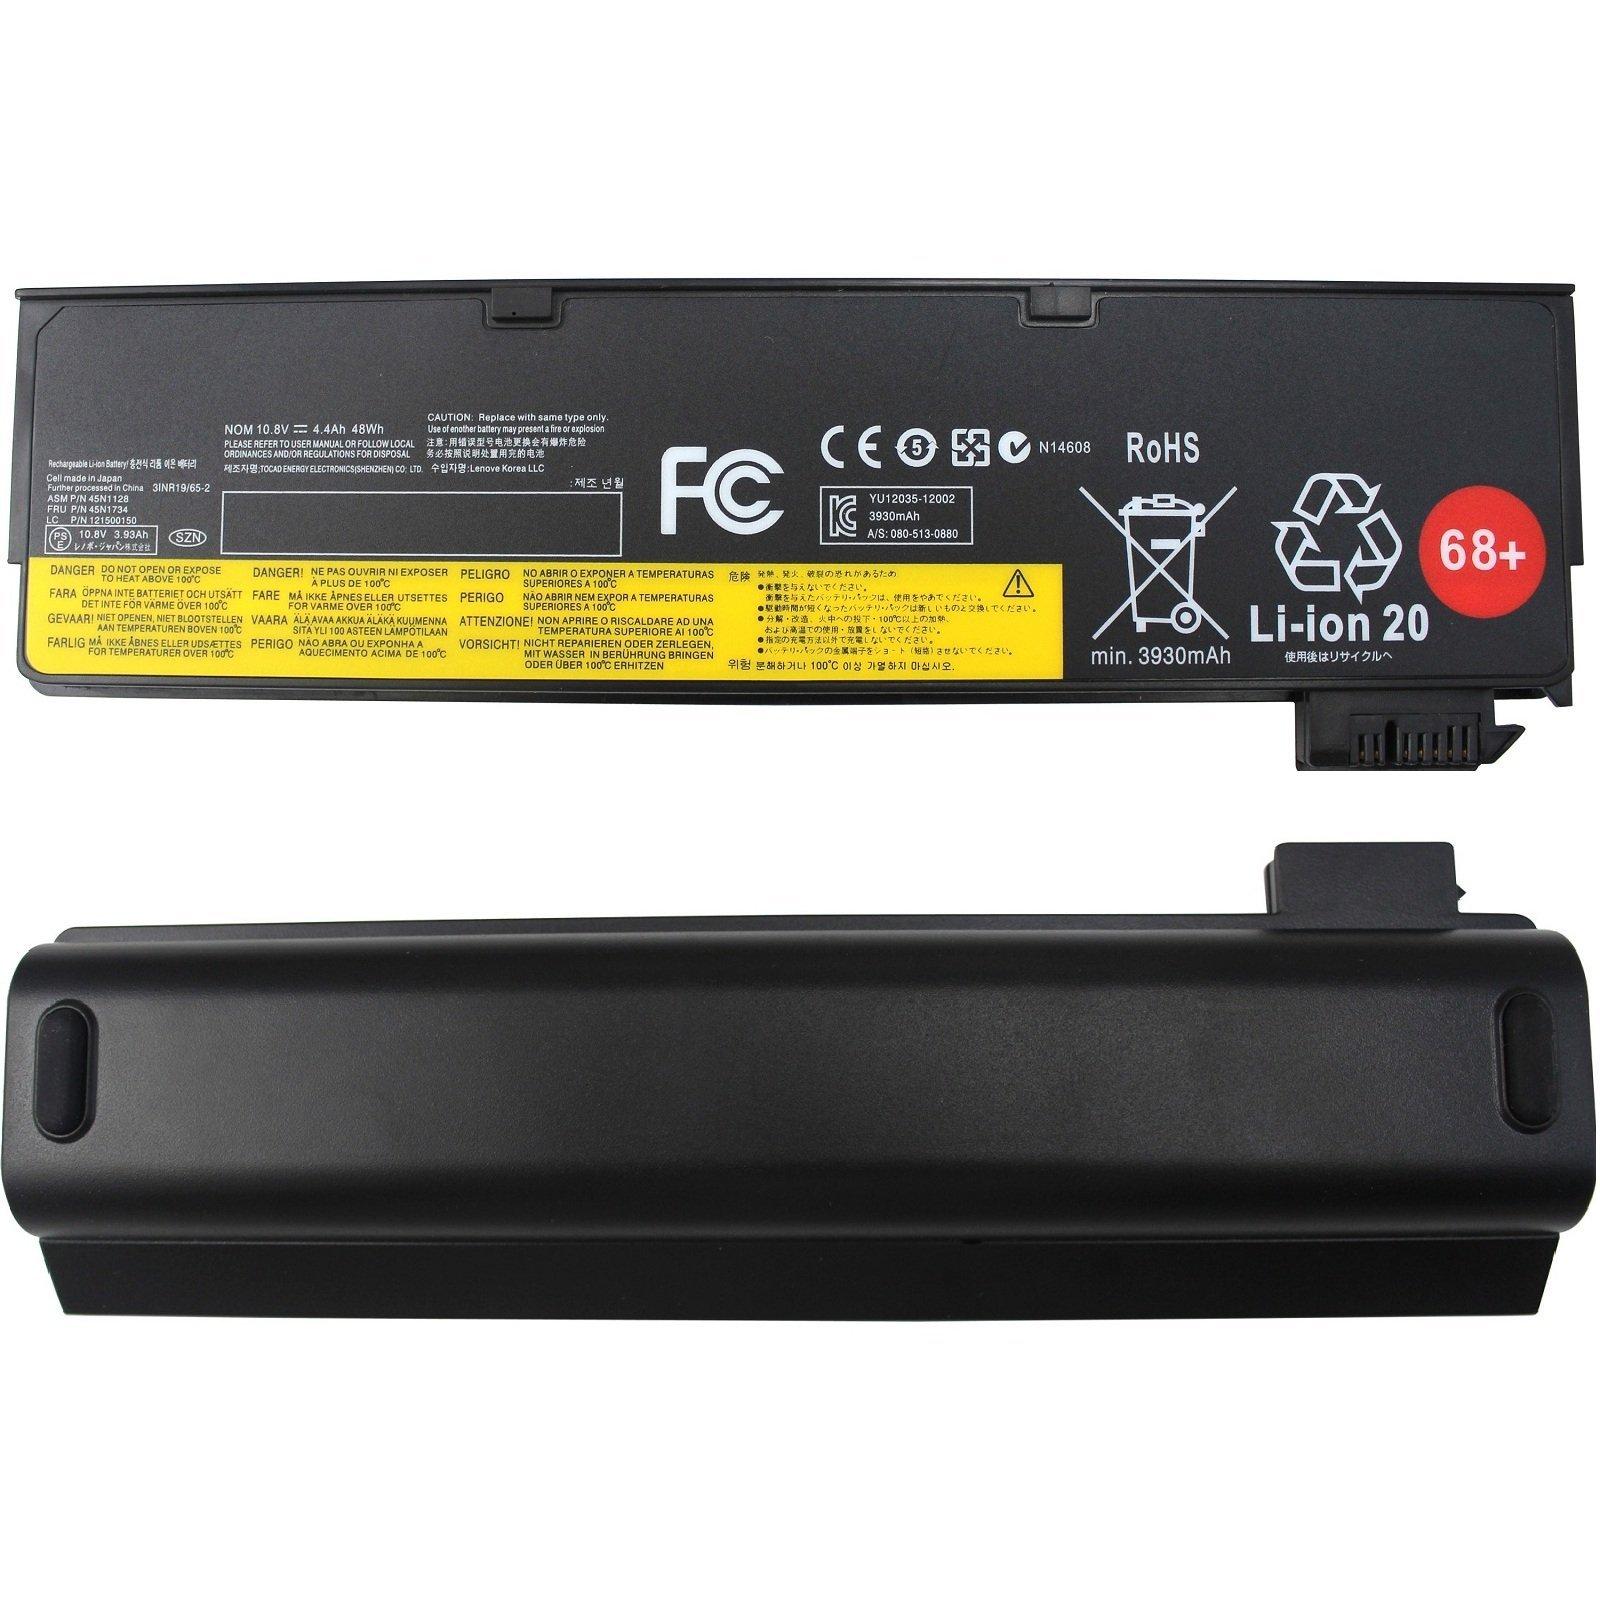 Bateria 45N1128 Lenovo ThinkPad T450s L460 T460P Series 1215